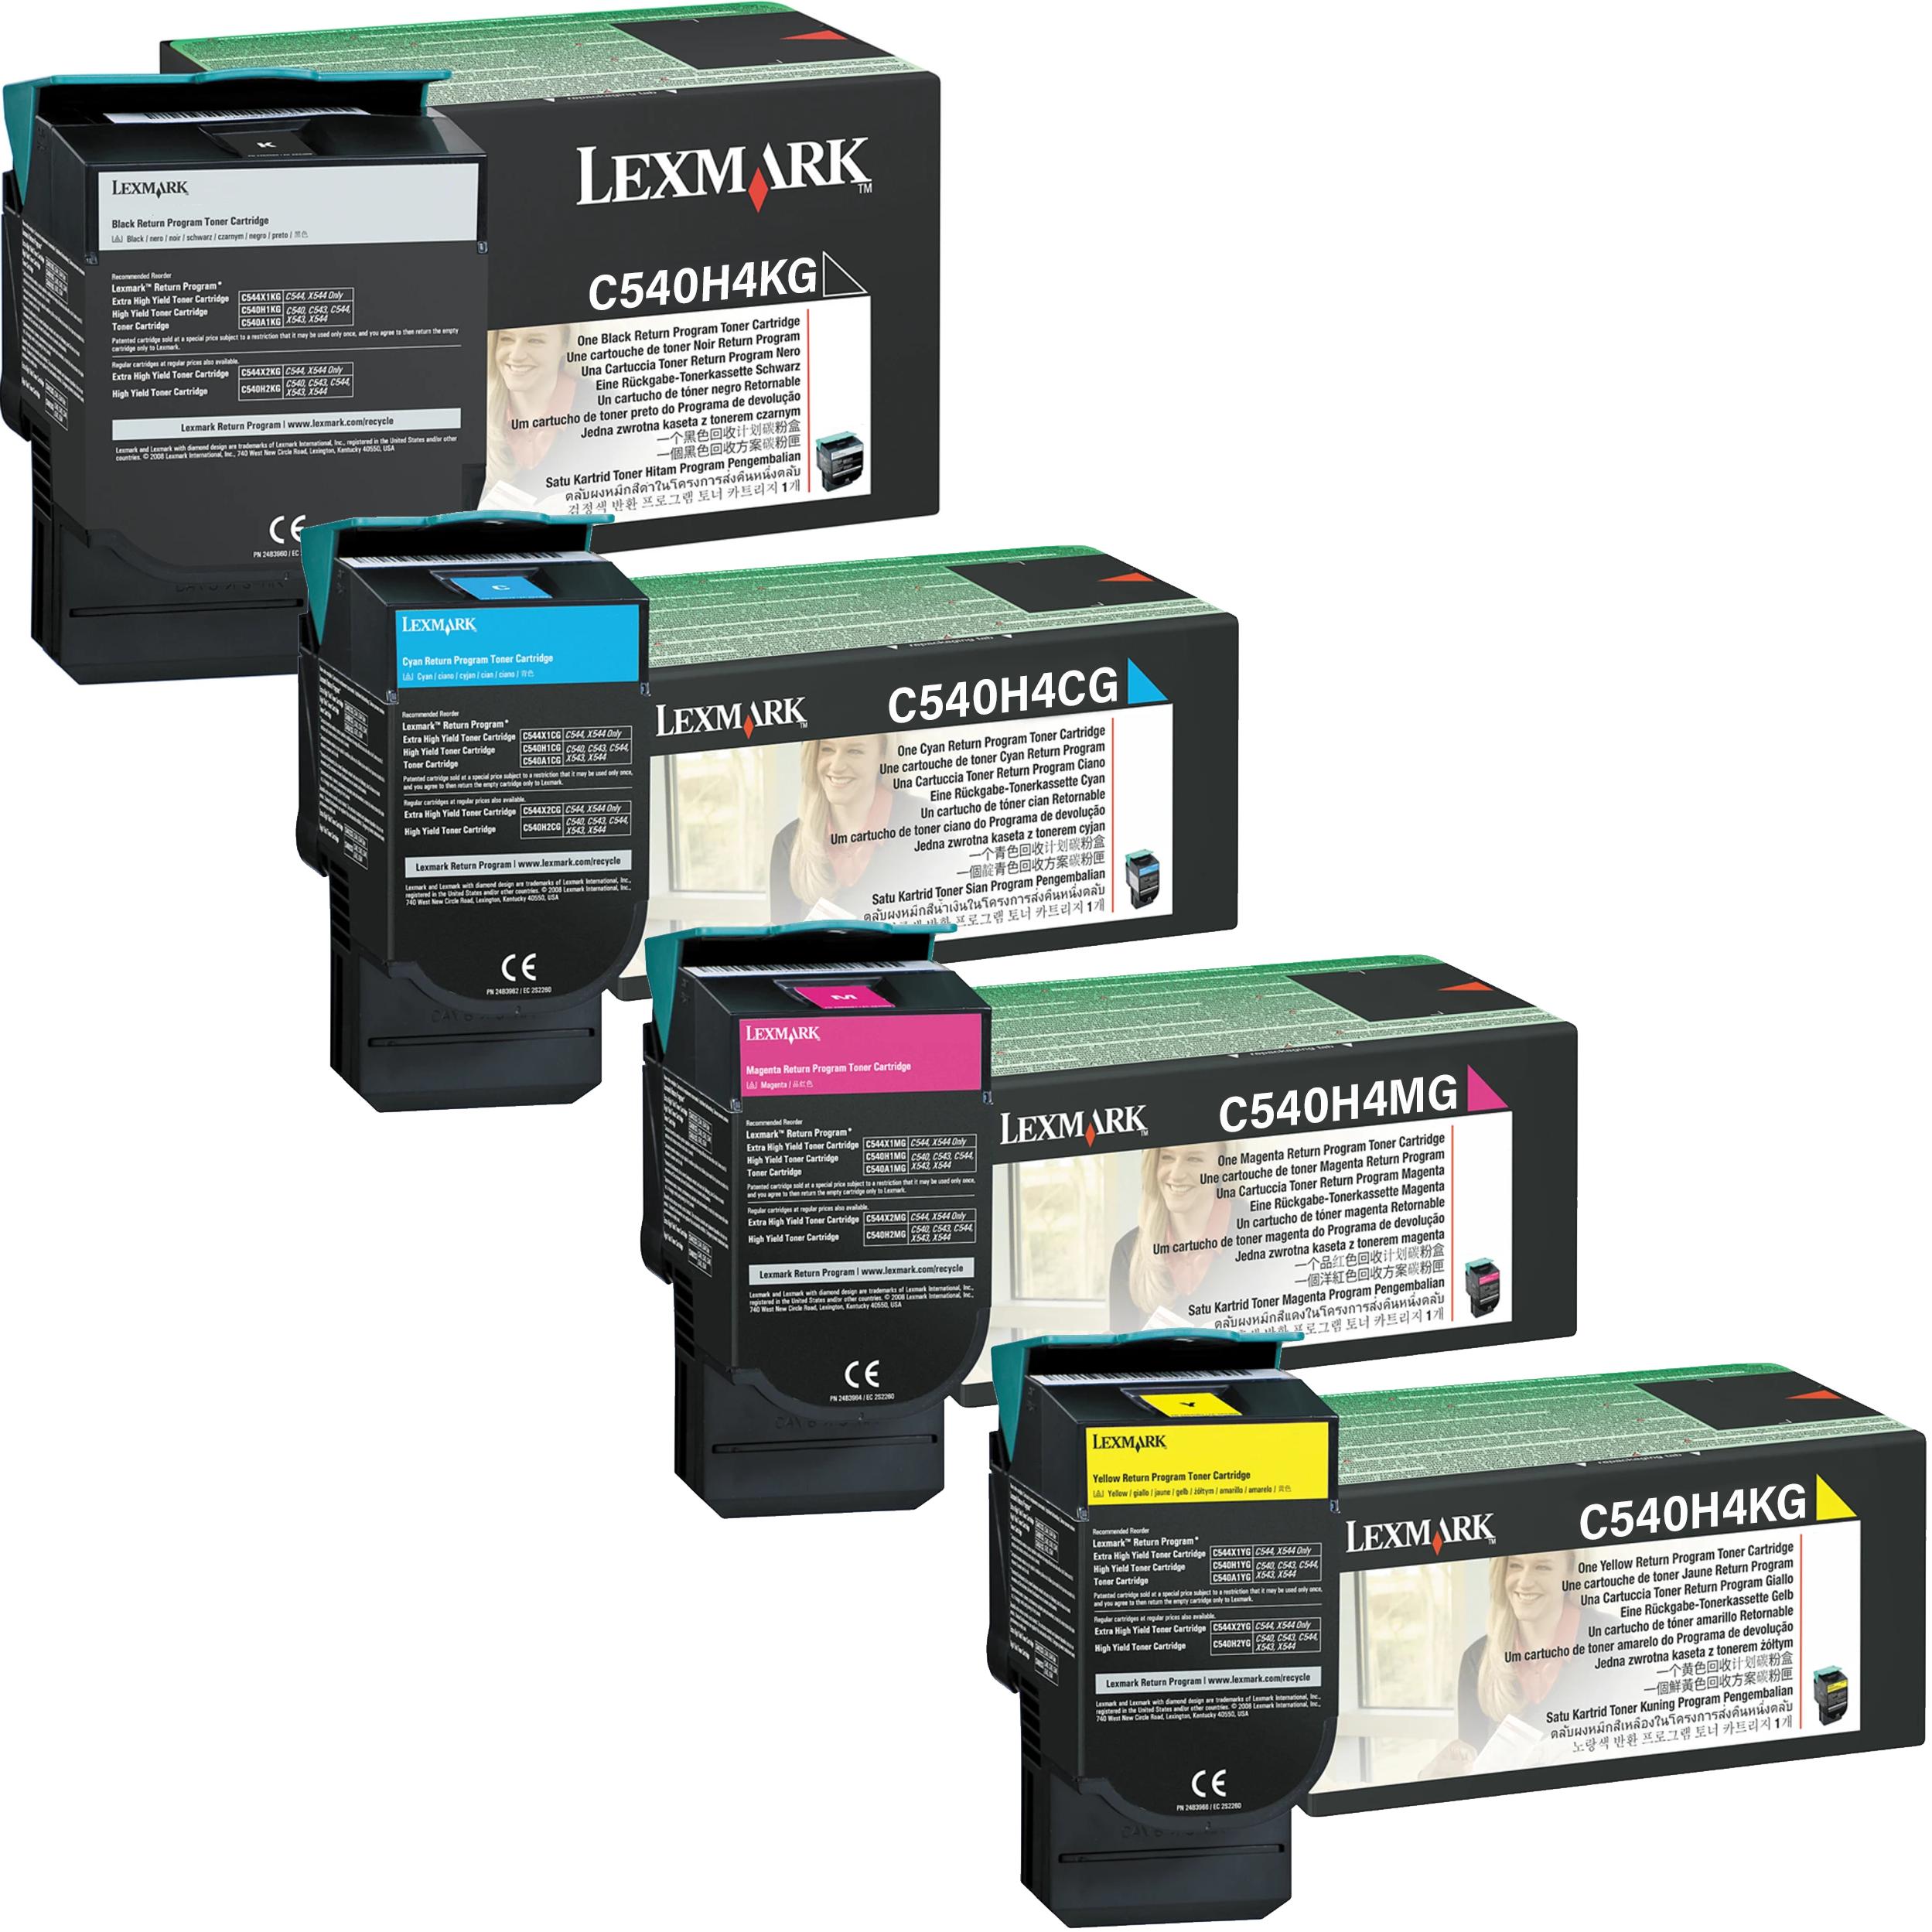 Lexmark C540H4 Set | C540H4CG C540H4KCG C540H4MG C540H4YG | Original Lexmark High-Yield Toner Cartridges – Black, Cyan, Magenta, Yellow